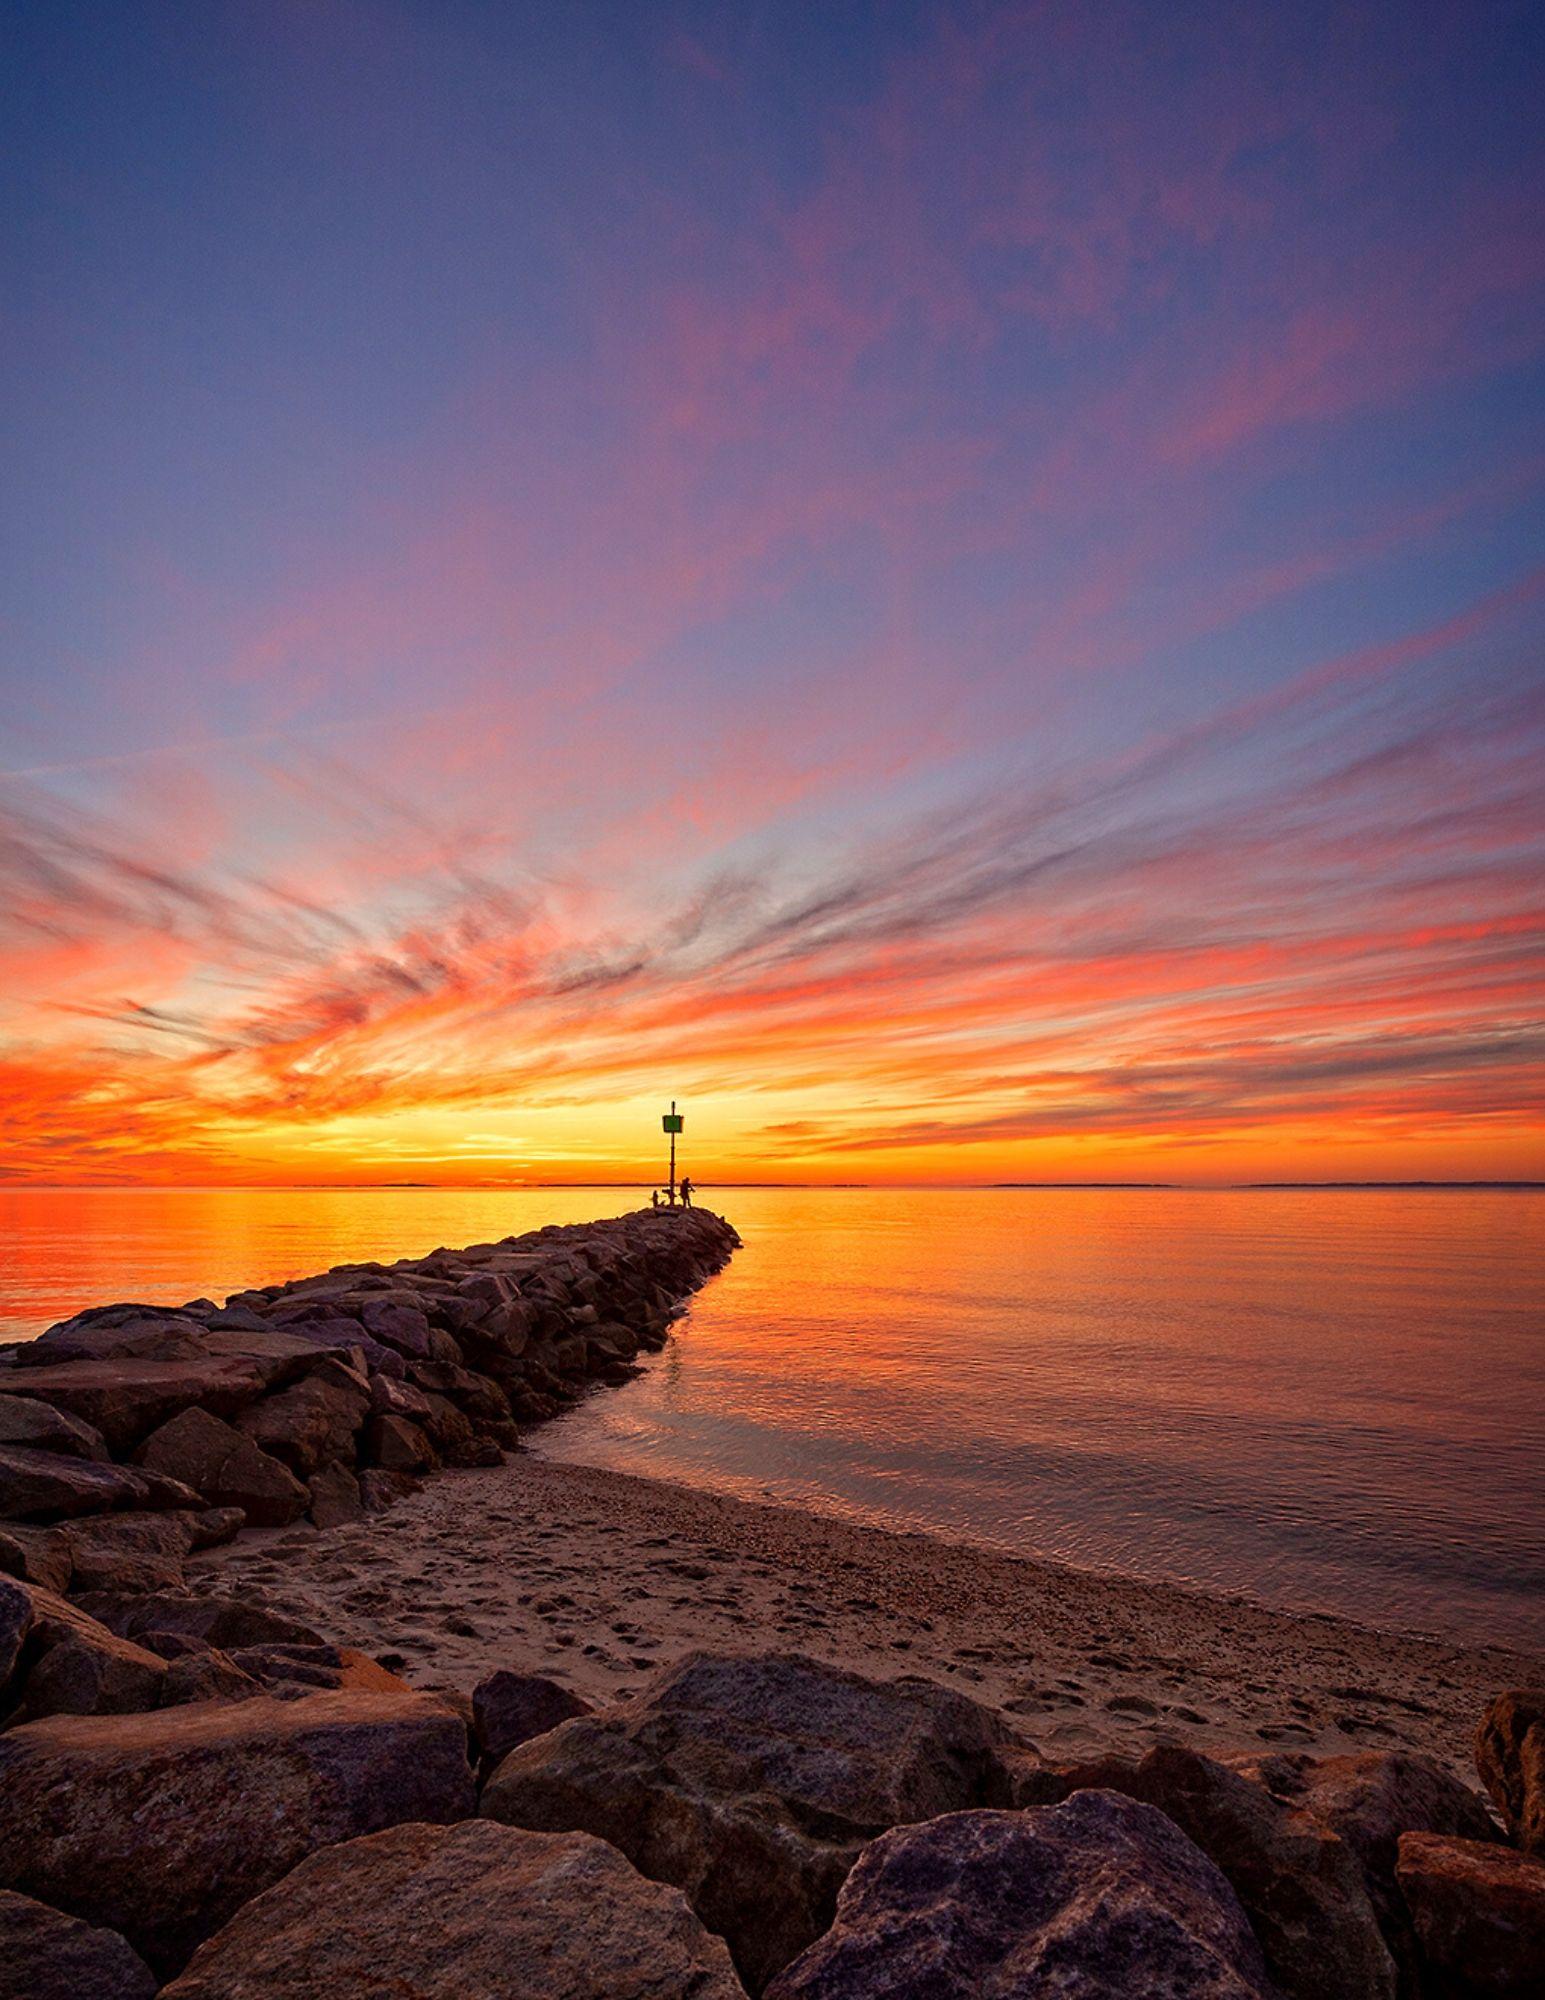 John Montes Jr Photography Best Places to Photograph Sunrise and Sunset on Marthas Vineyard-Best Places to Photograph Sunrise and Sunset on Marthas Vineyard-24